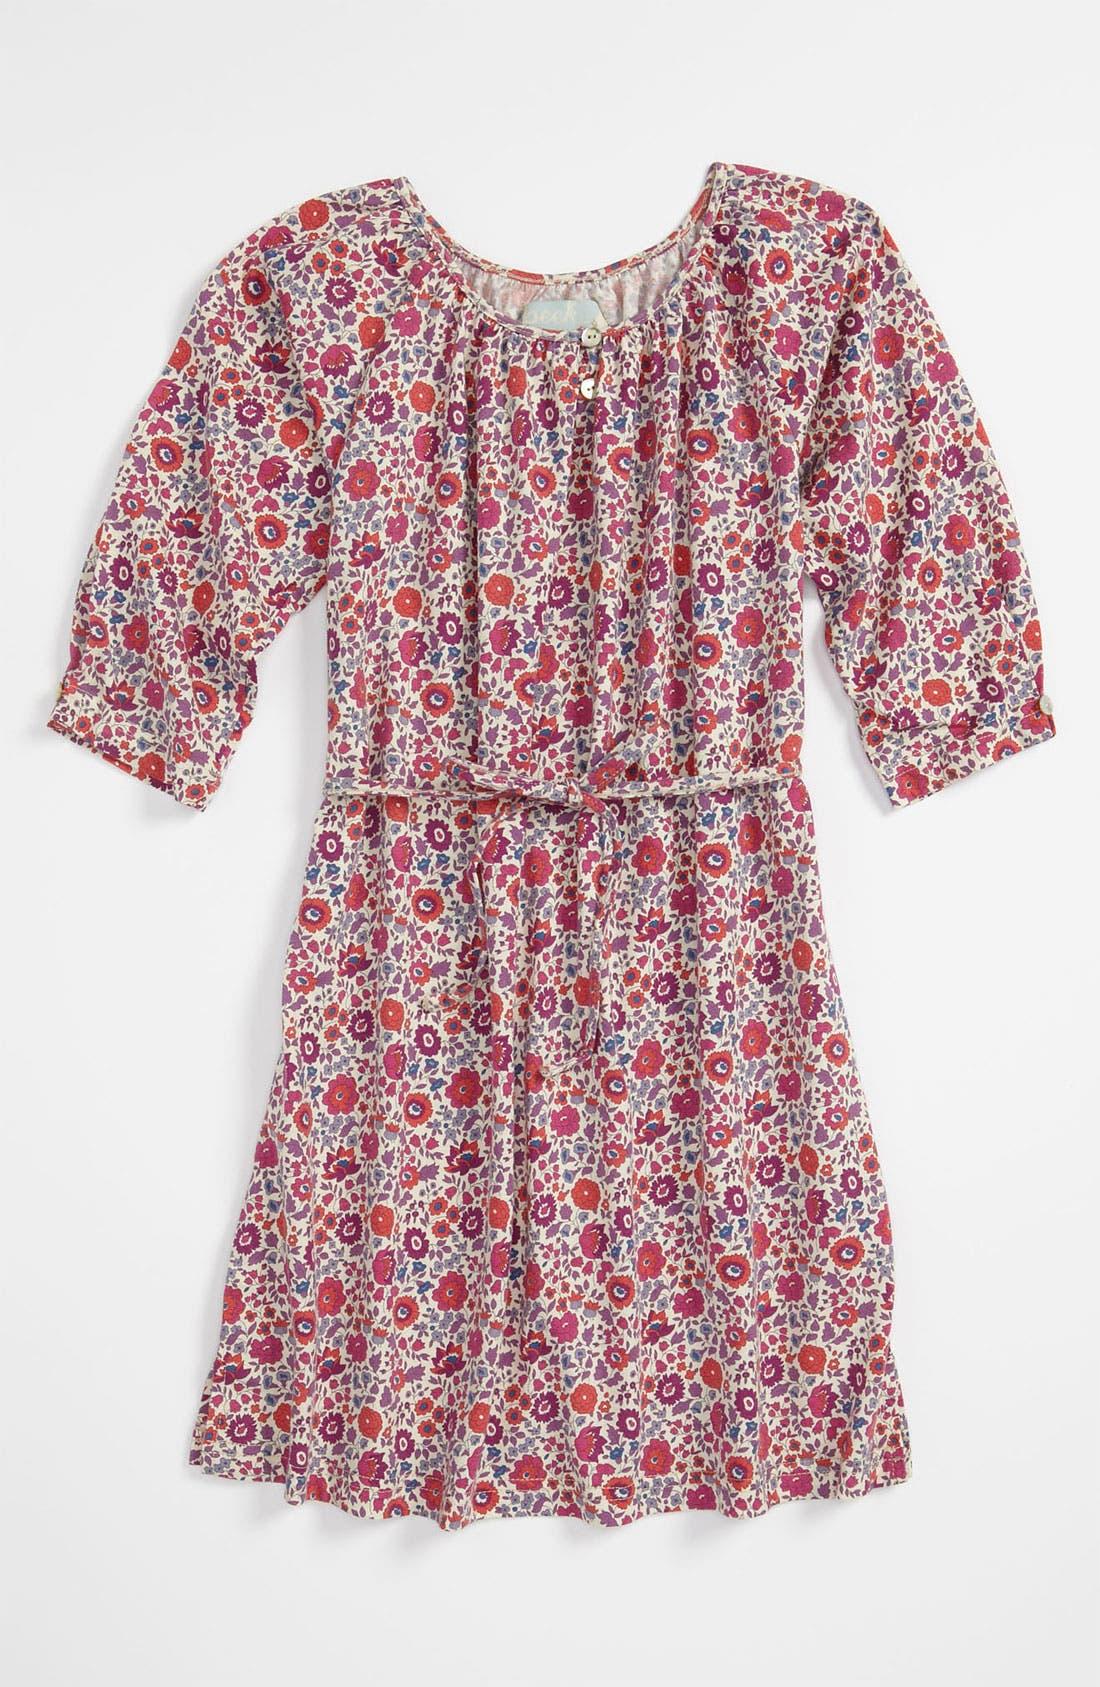 Alternate Image 1 Selected - Peek 'Suzy' Shirtdress (Toddler, Little Girls & Big Girls)